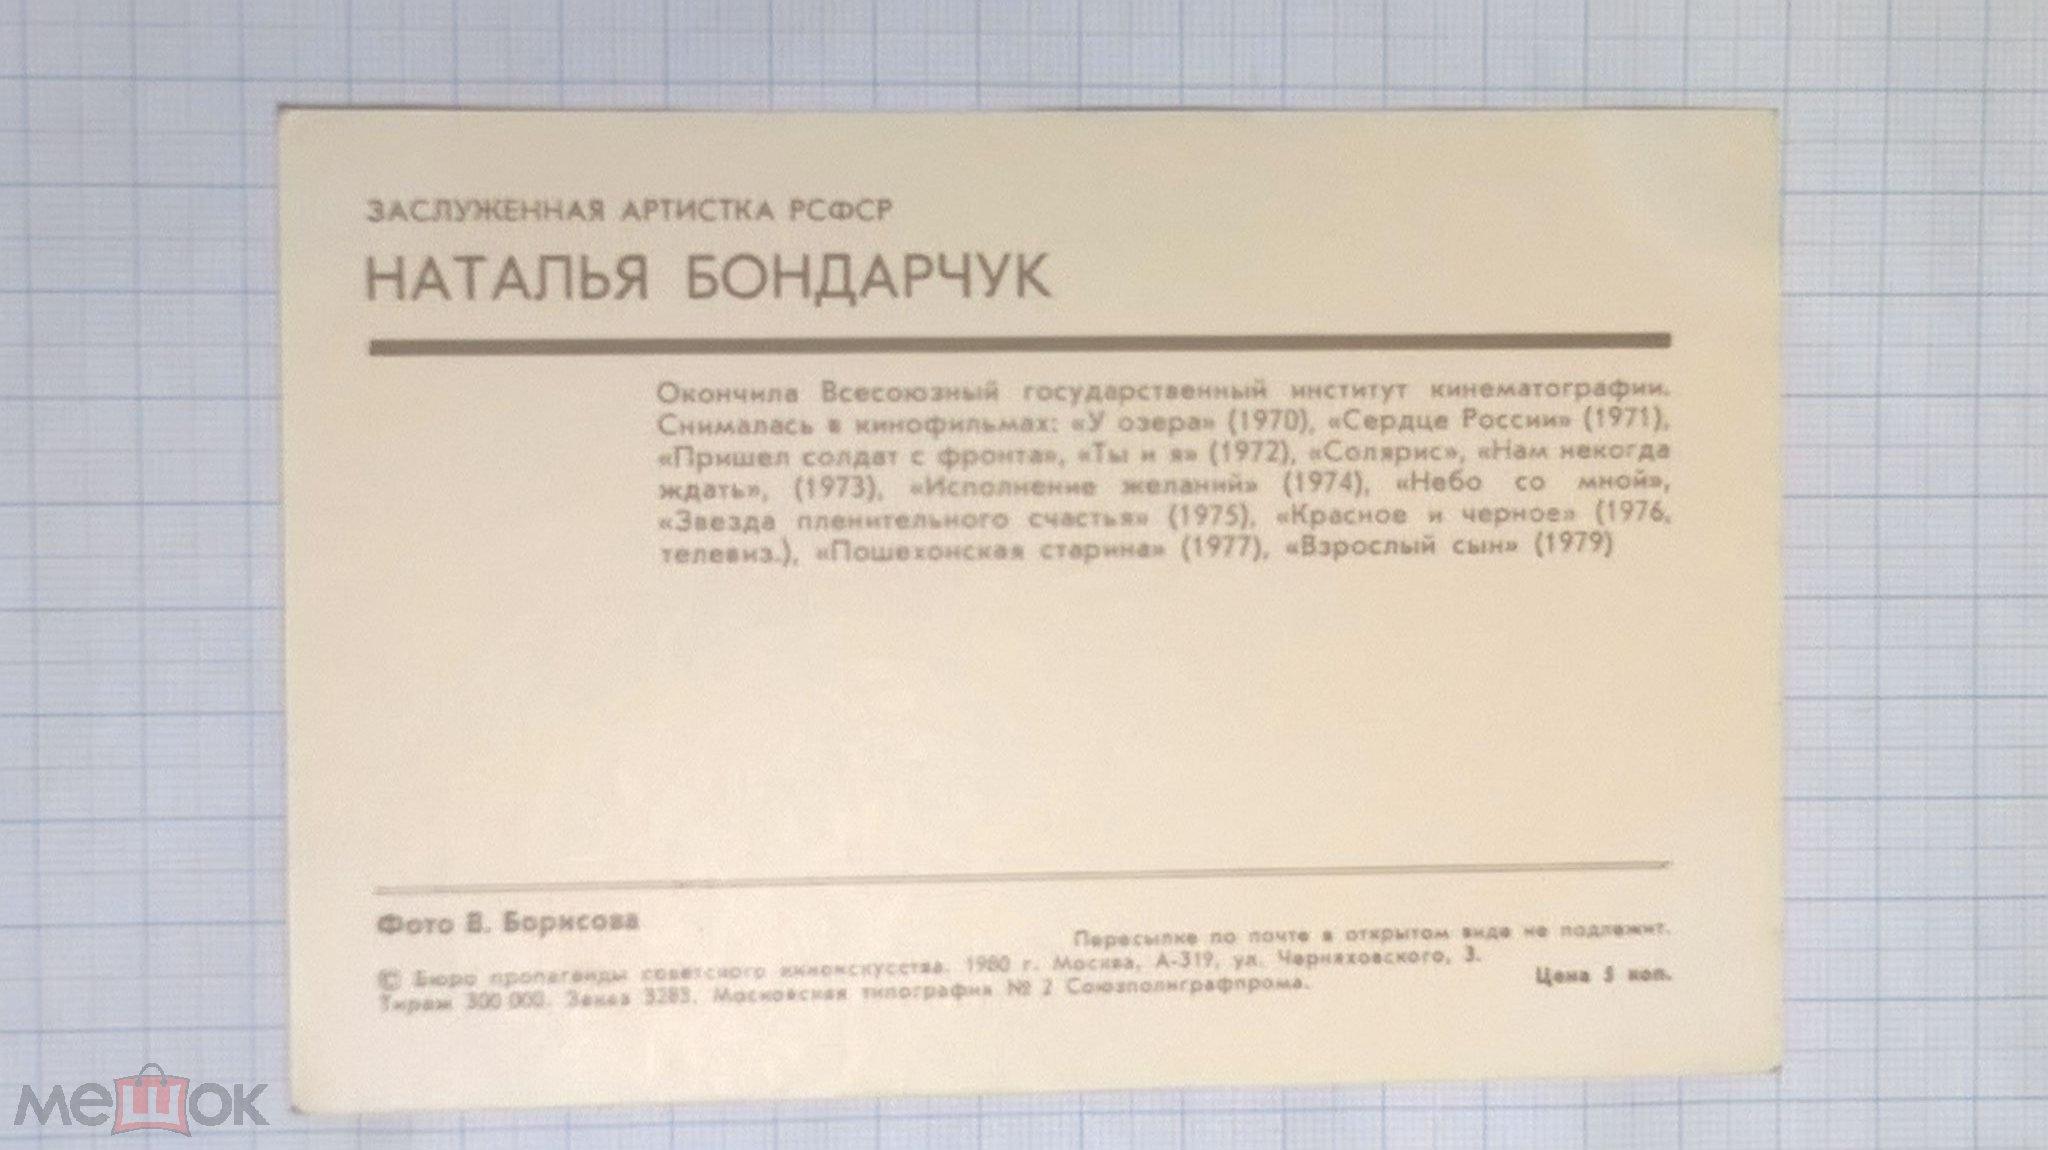 Артисты кино и театра. Наталья Бондарчук 1980 год